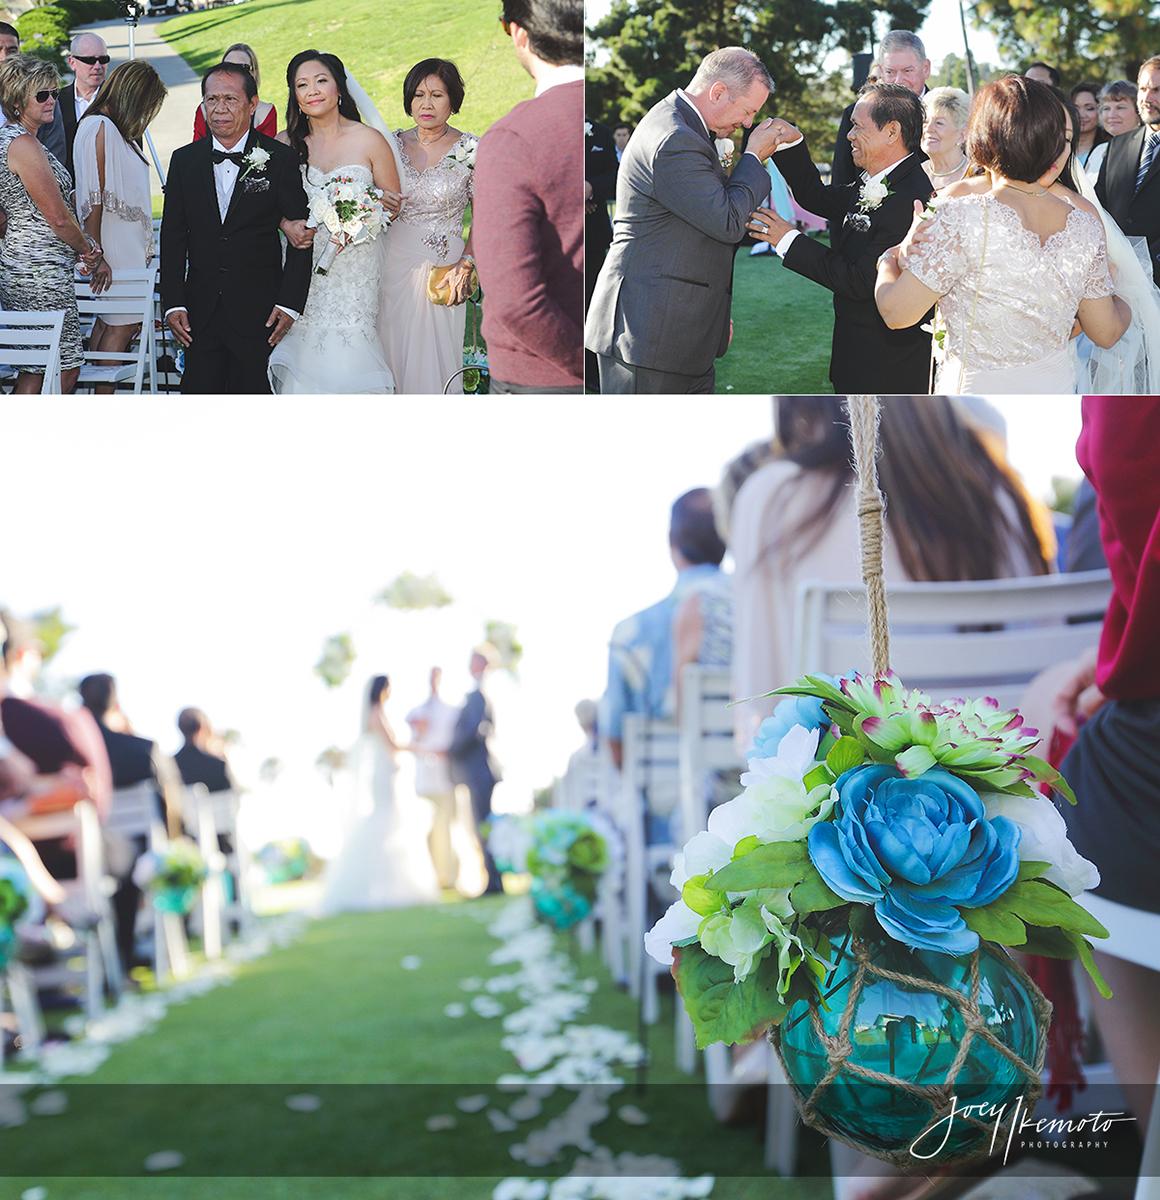 Terrena-Resort-Palos-verdes-and-La-Venta-Inn-Wedding_0027_Blog-Collage-1471479269585